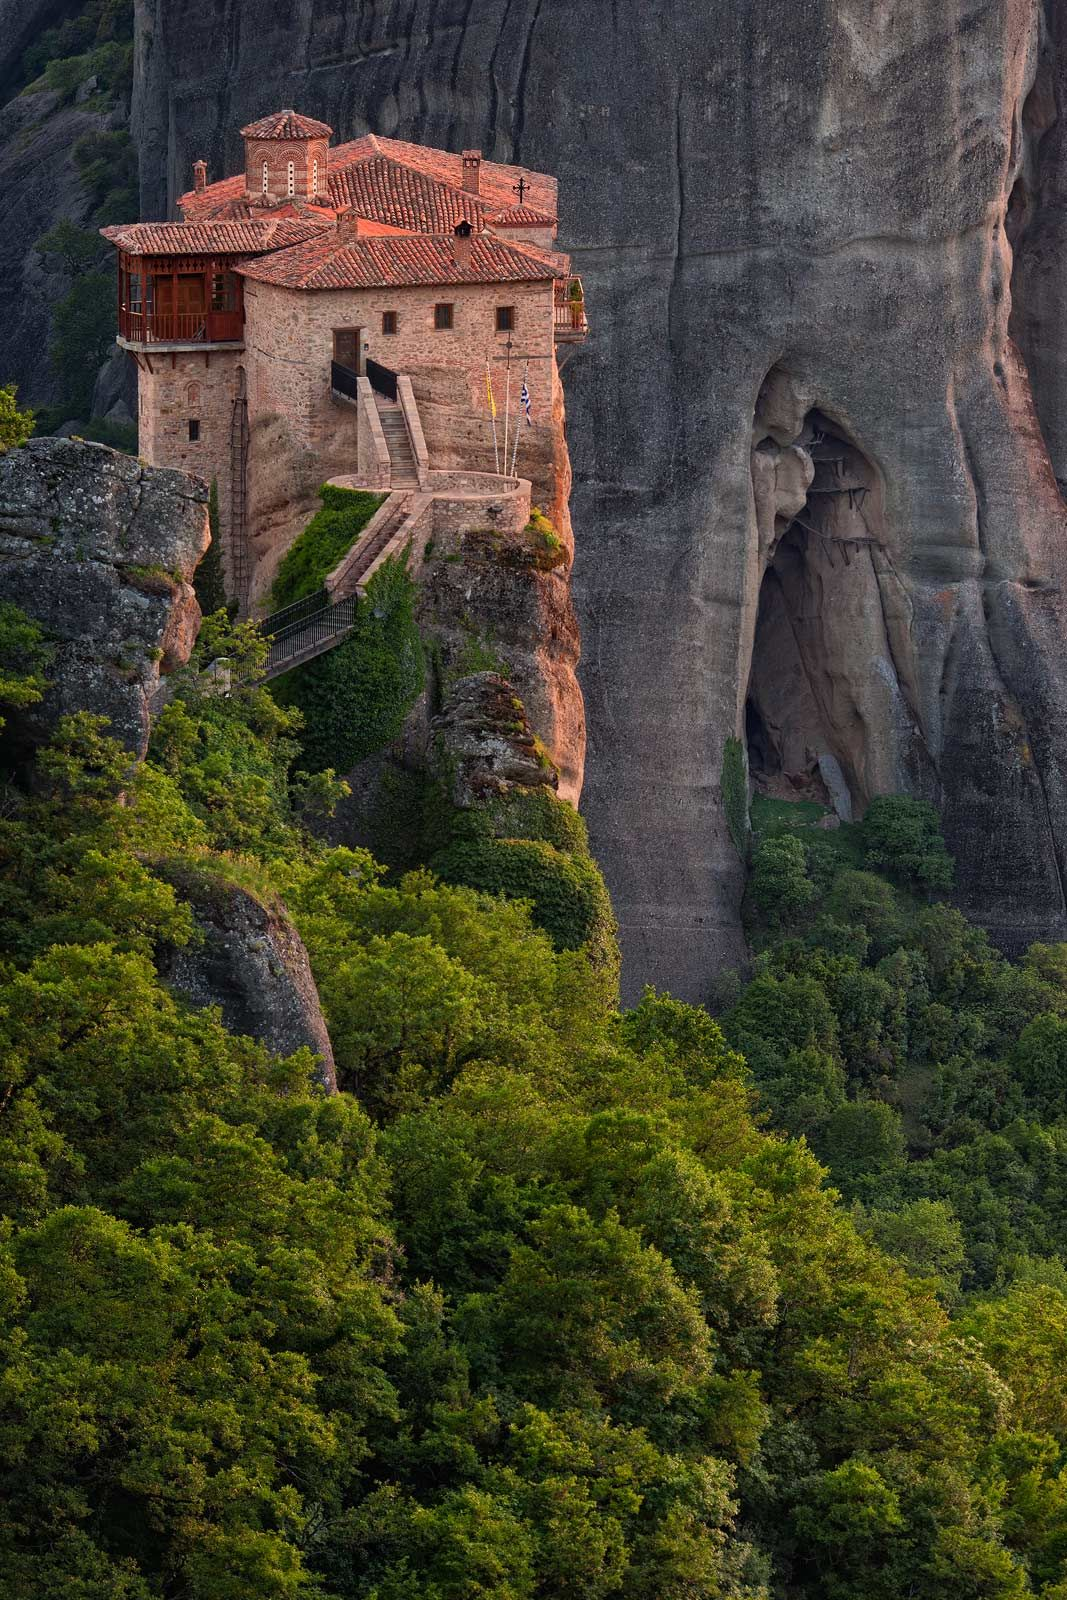 nunnerys | Roussanou Nunnery, Meteora, Thessaly, Greece ...